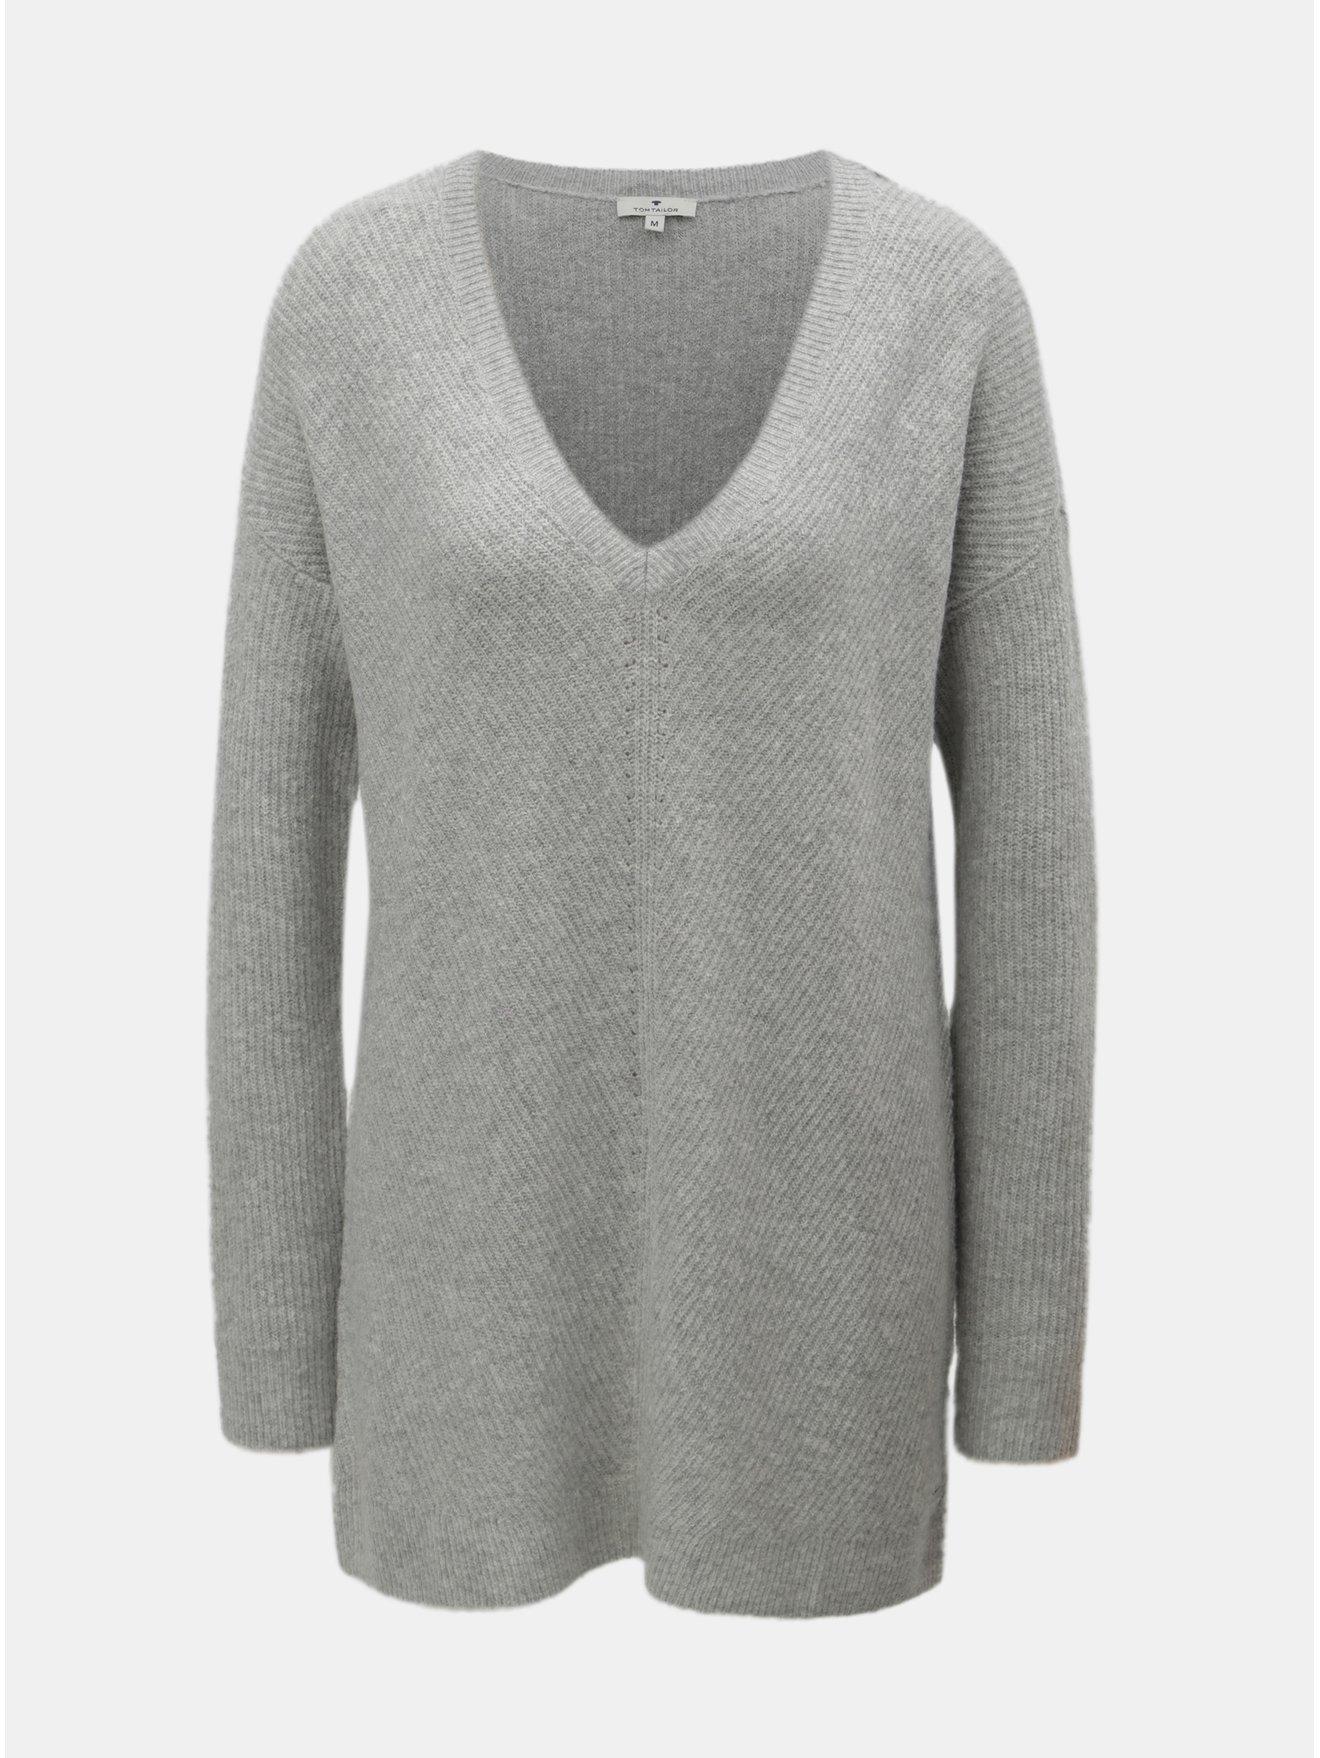 41efe6ec90b Luxusni damsky dlouhy svetr damsky svetr levně